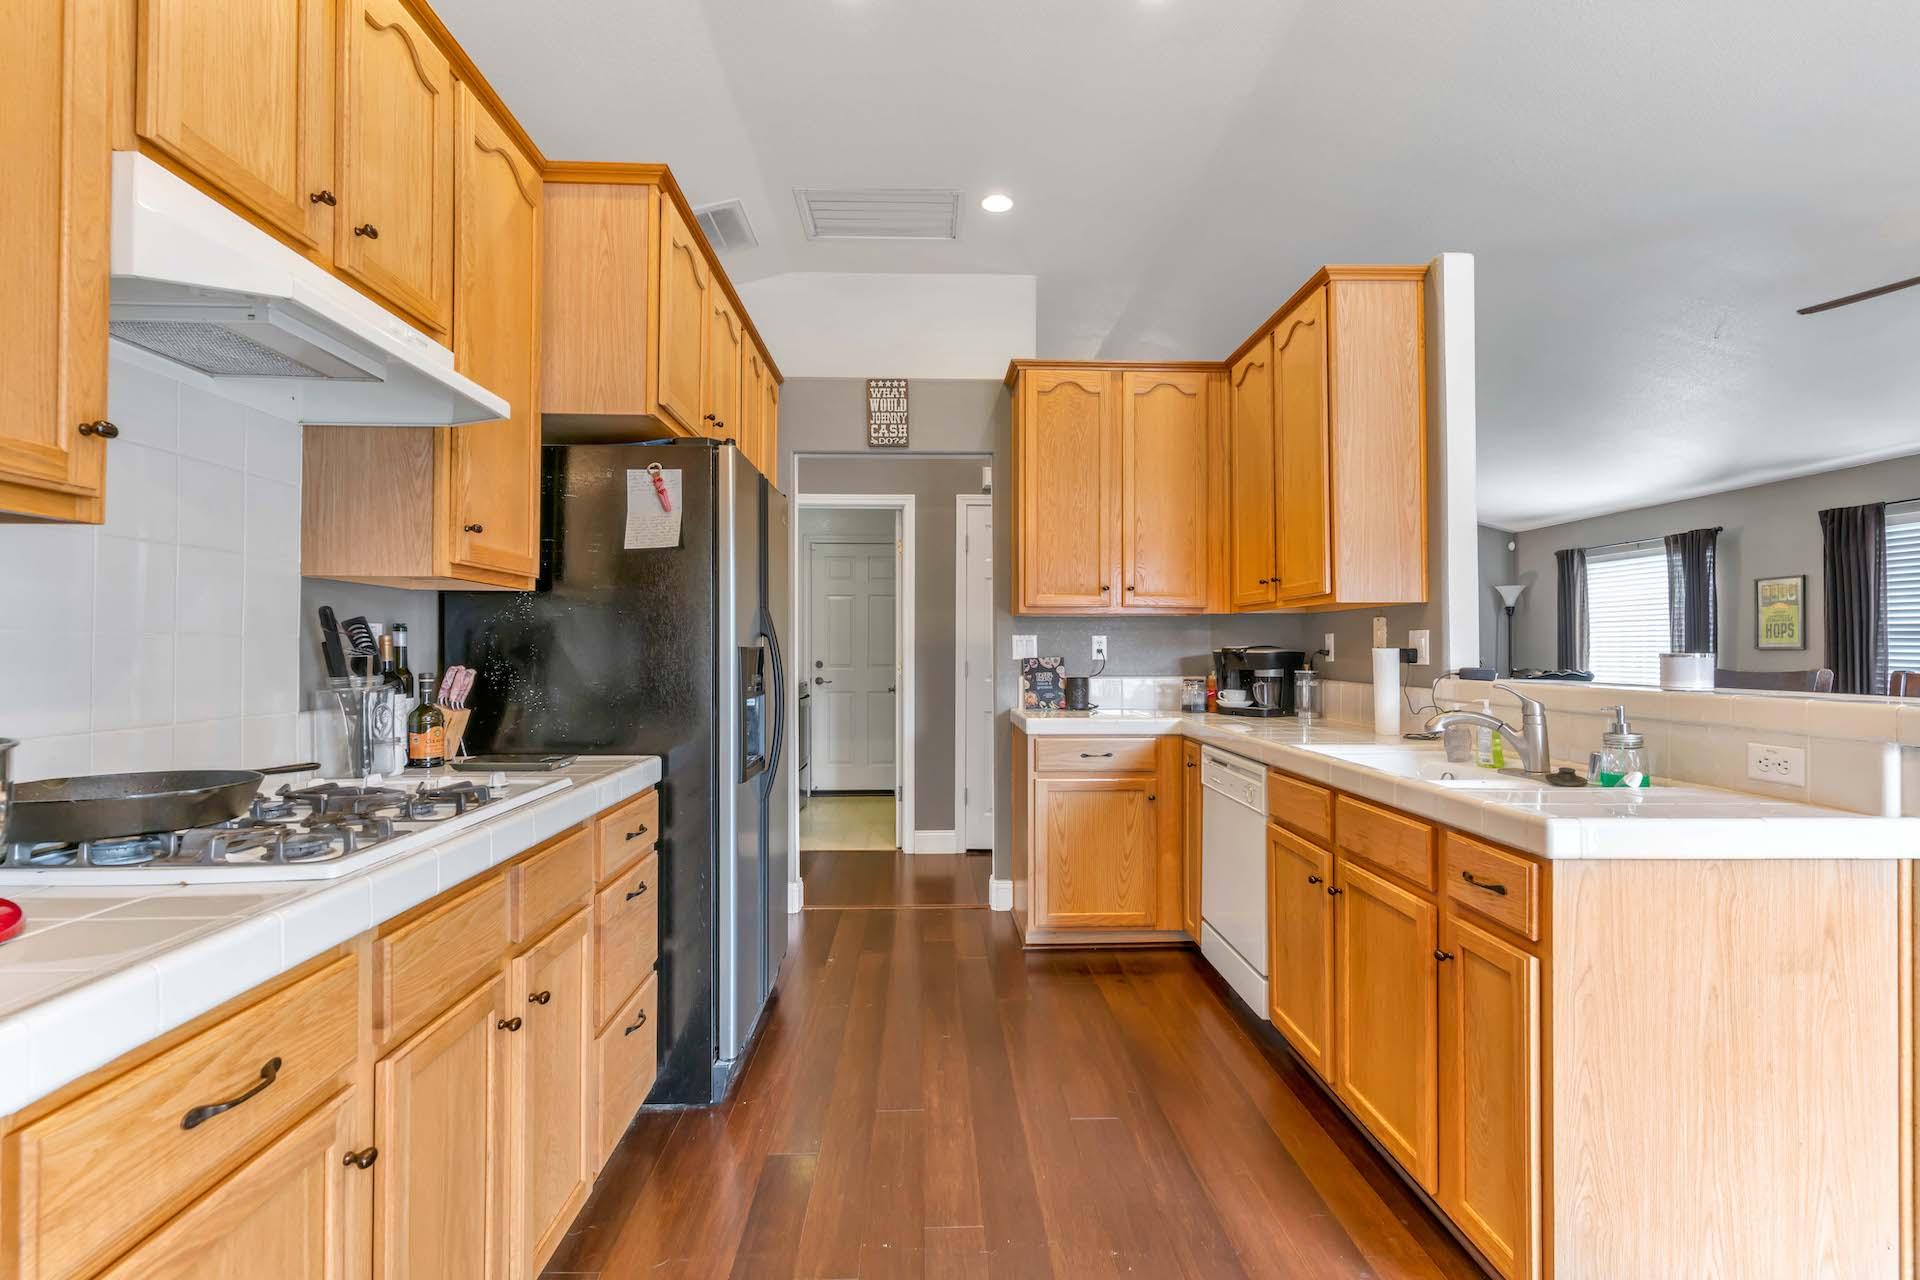 157 Clydesdale Way, Roseville, Ca | Kitchen | Roseville Real Estate Agent